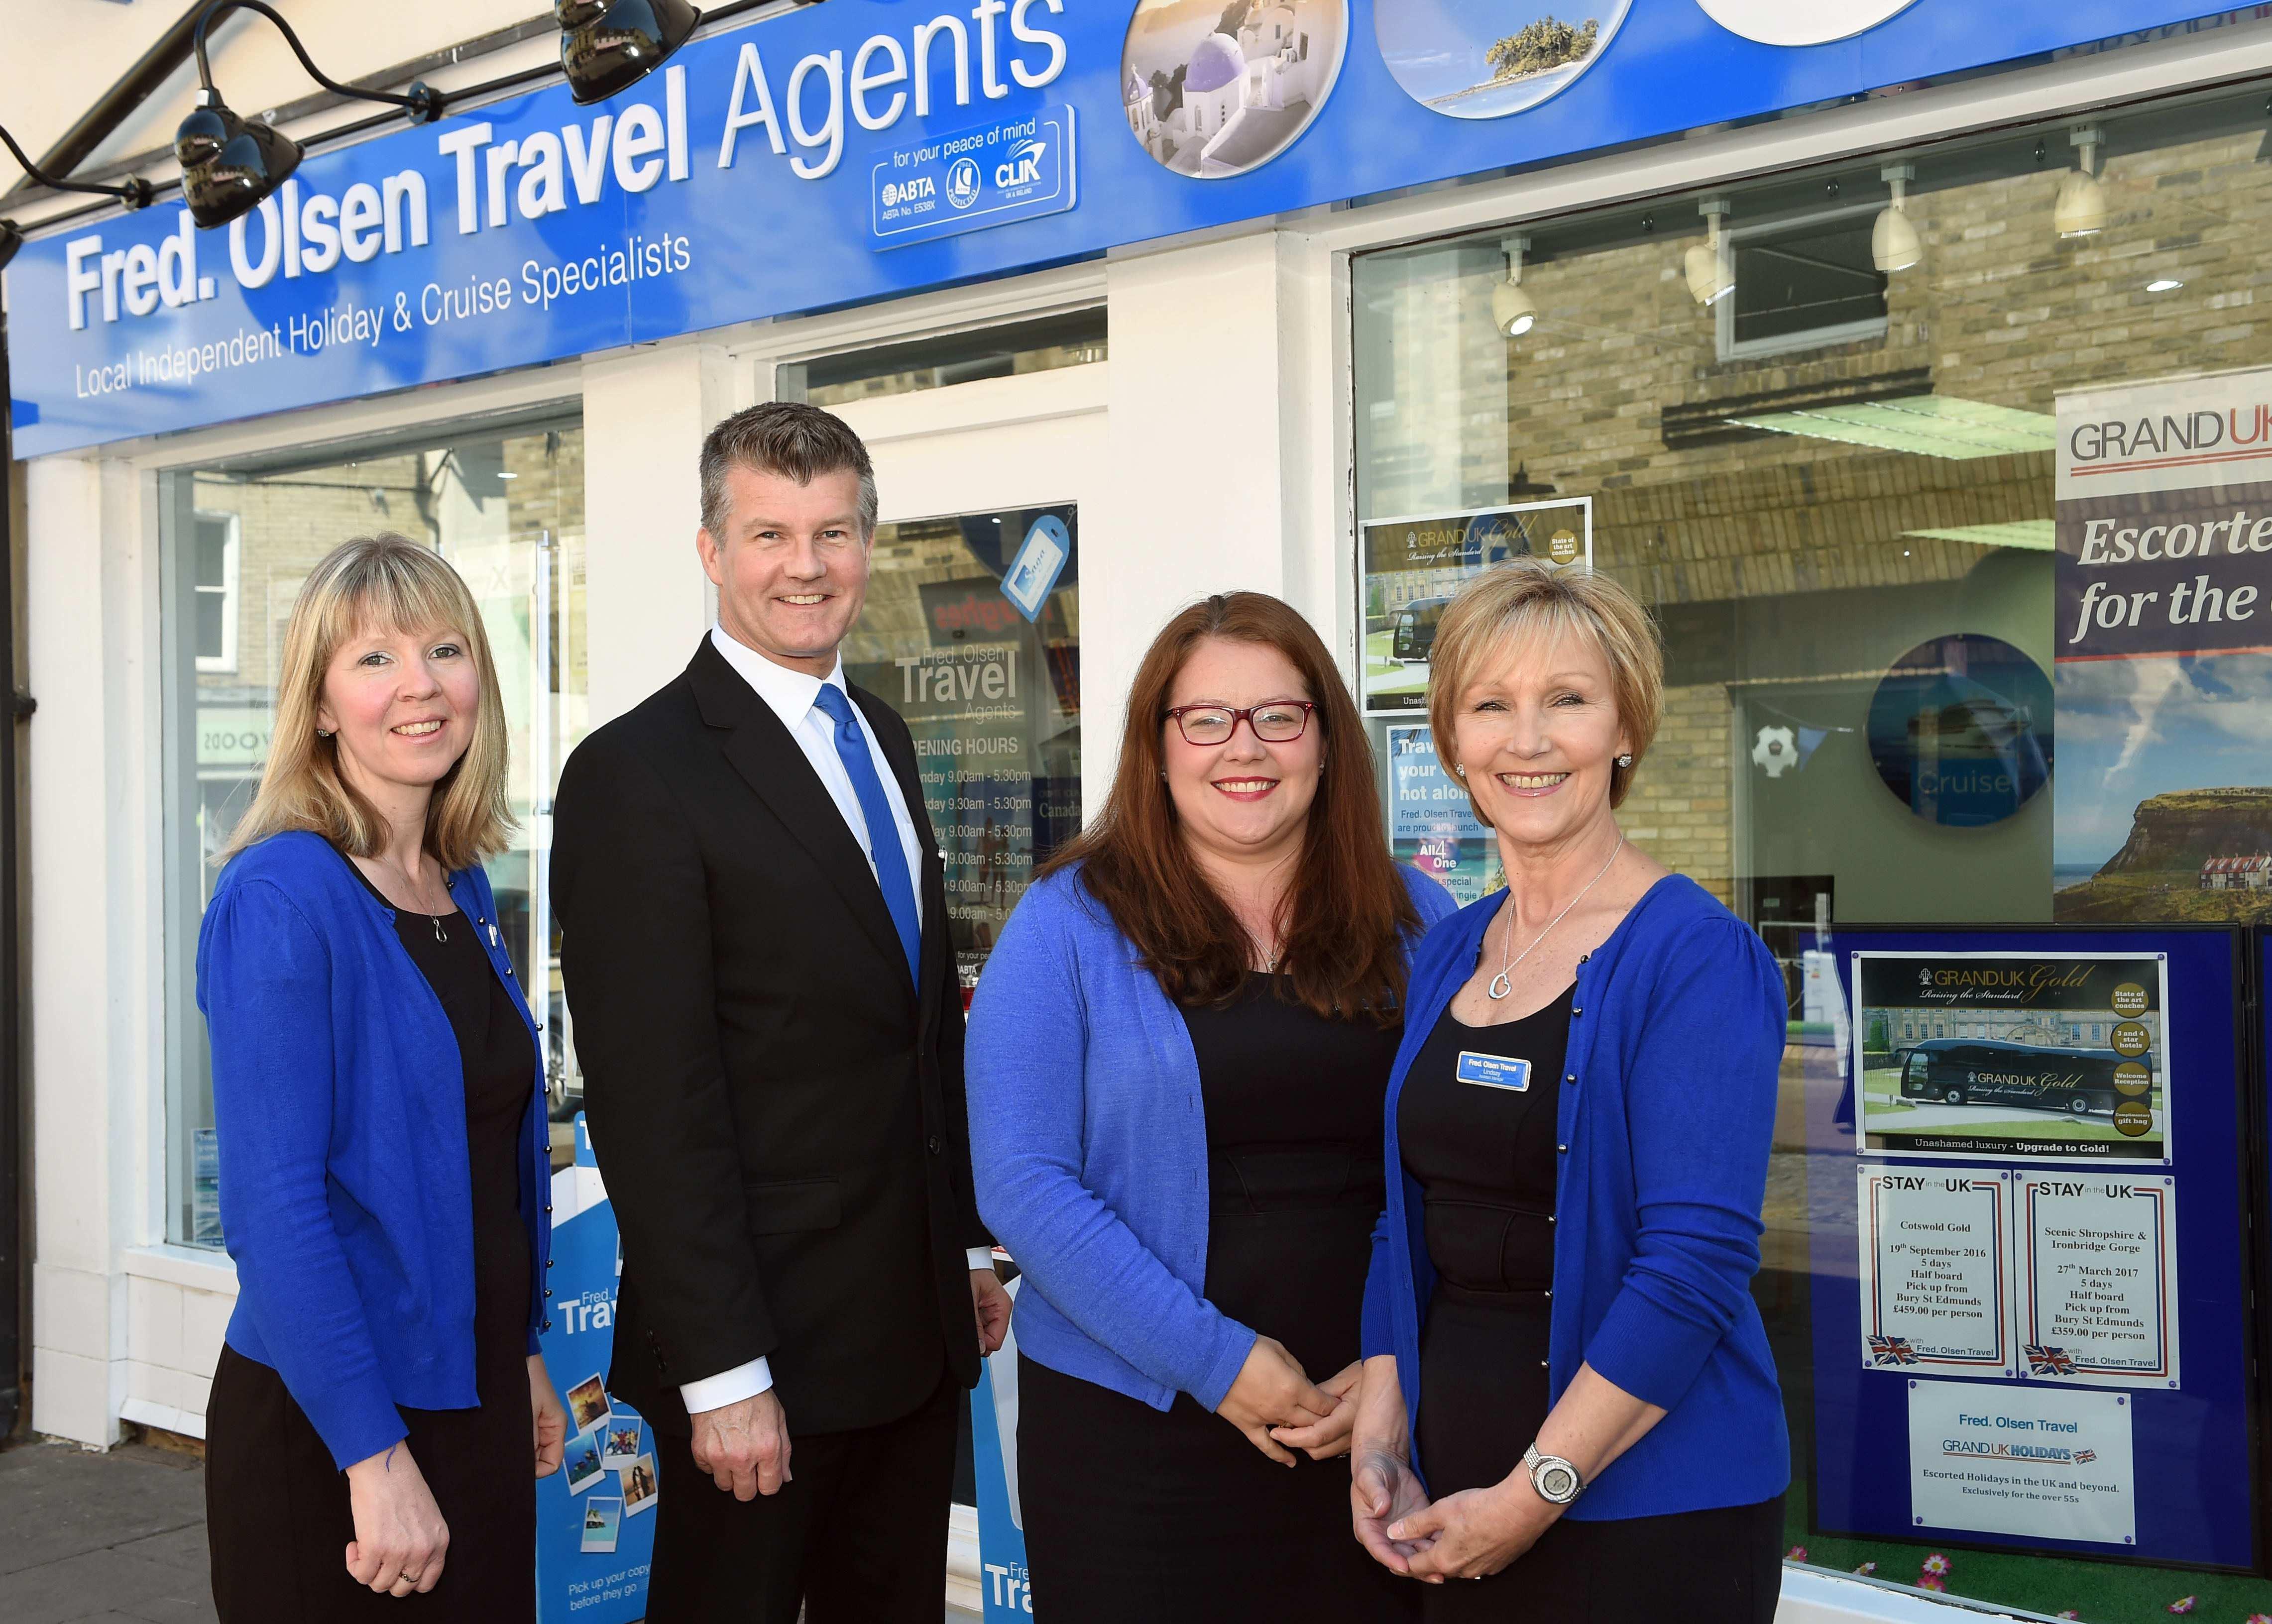 Fred Olson Travel Agency